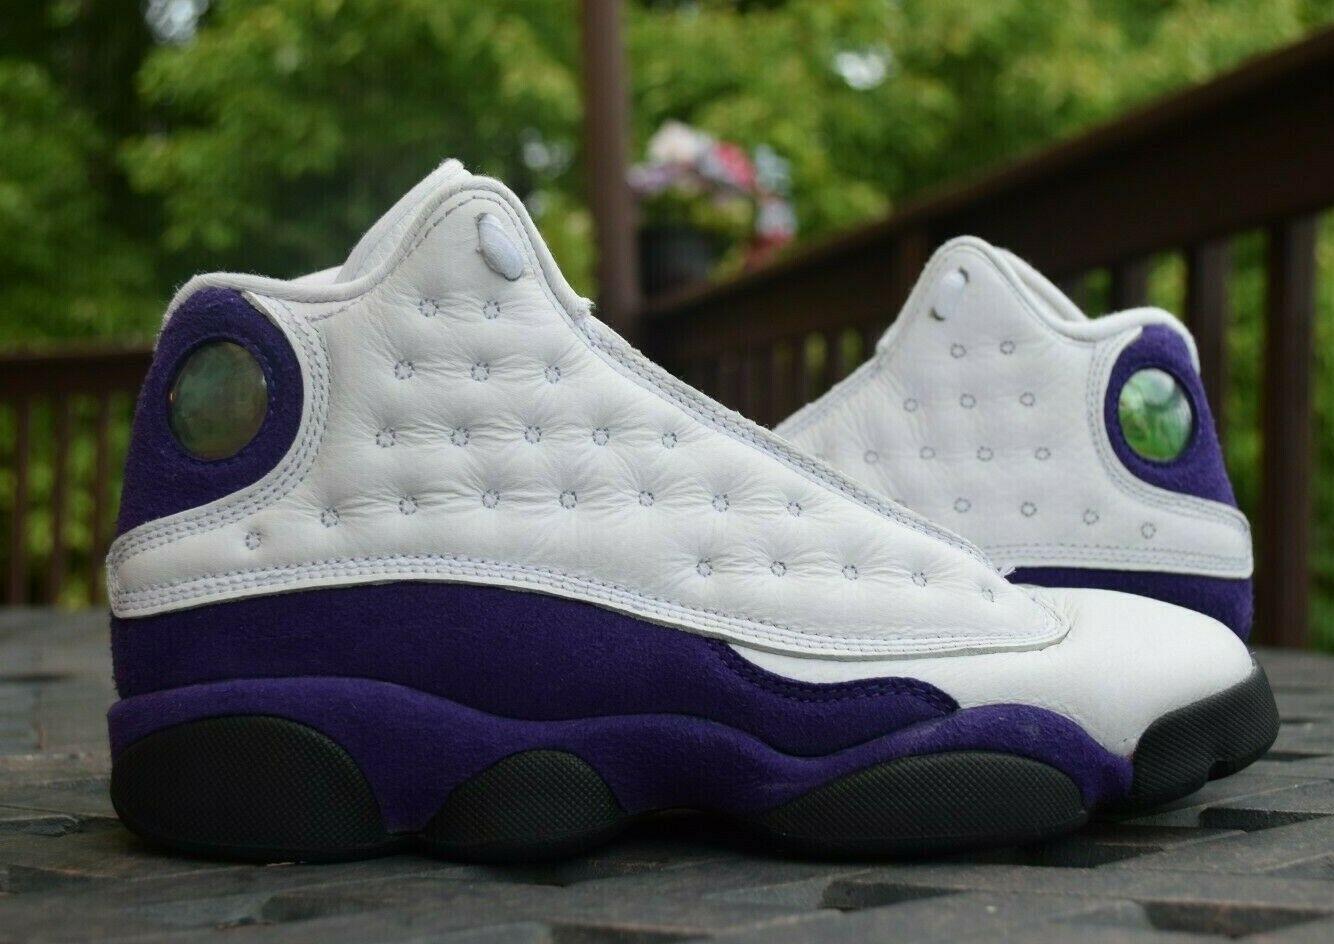 Jordan 13 Retro Lakers GS